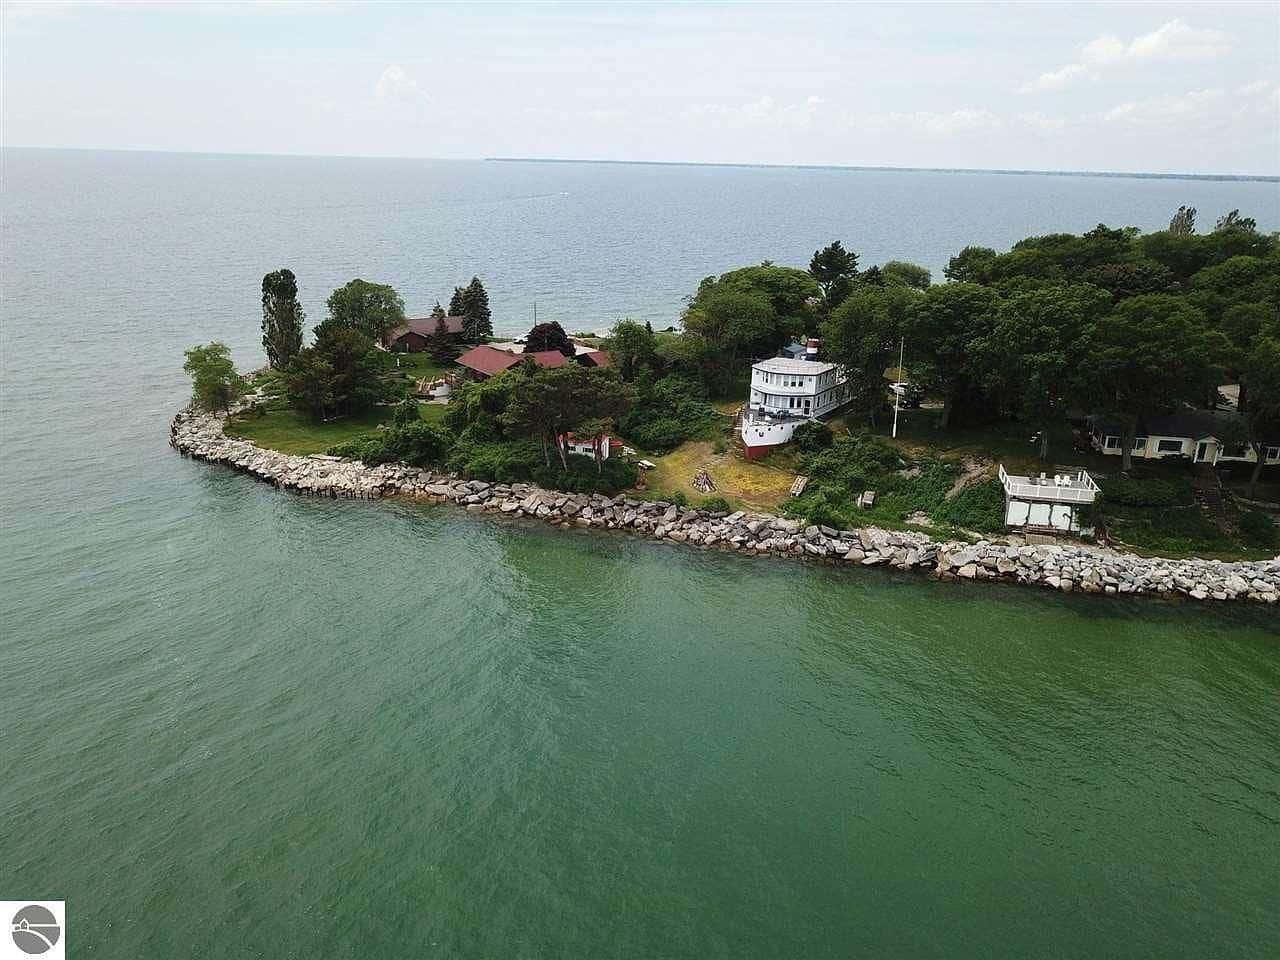 zillow boat house lake huron